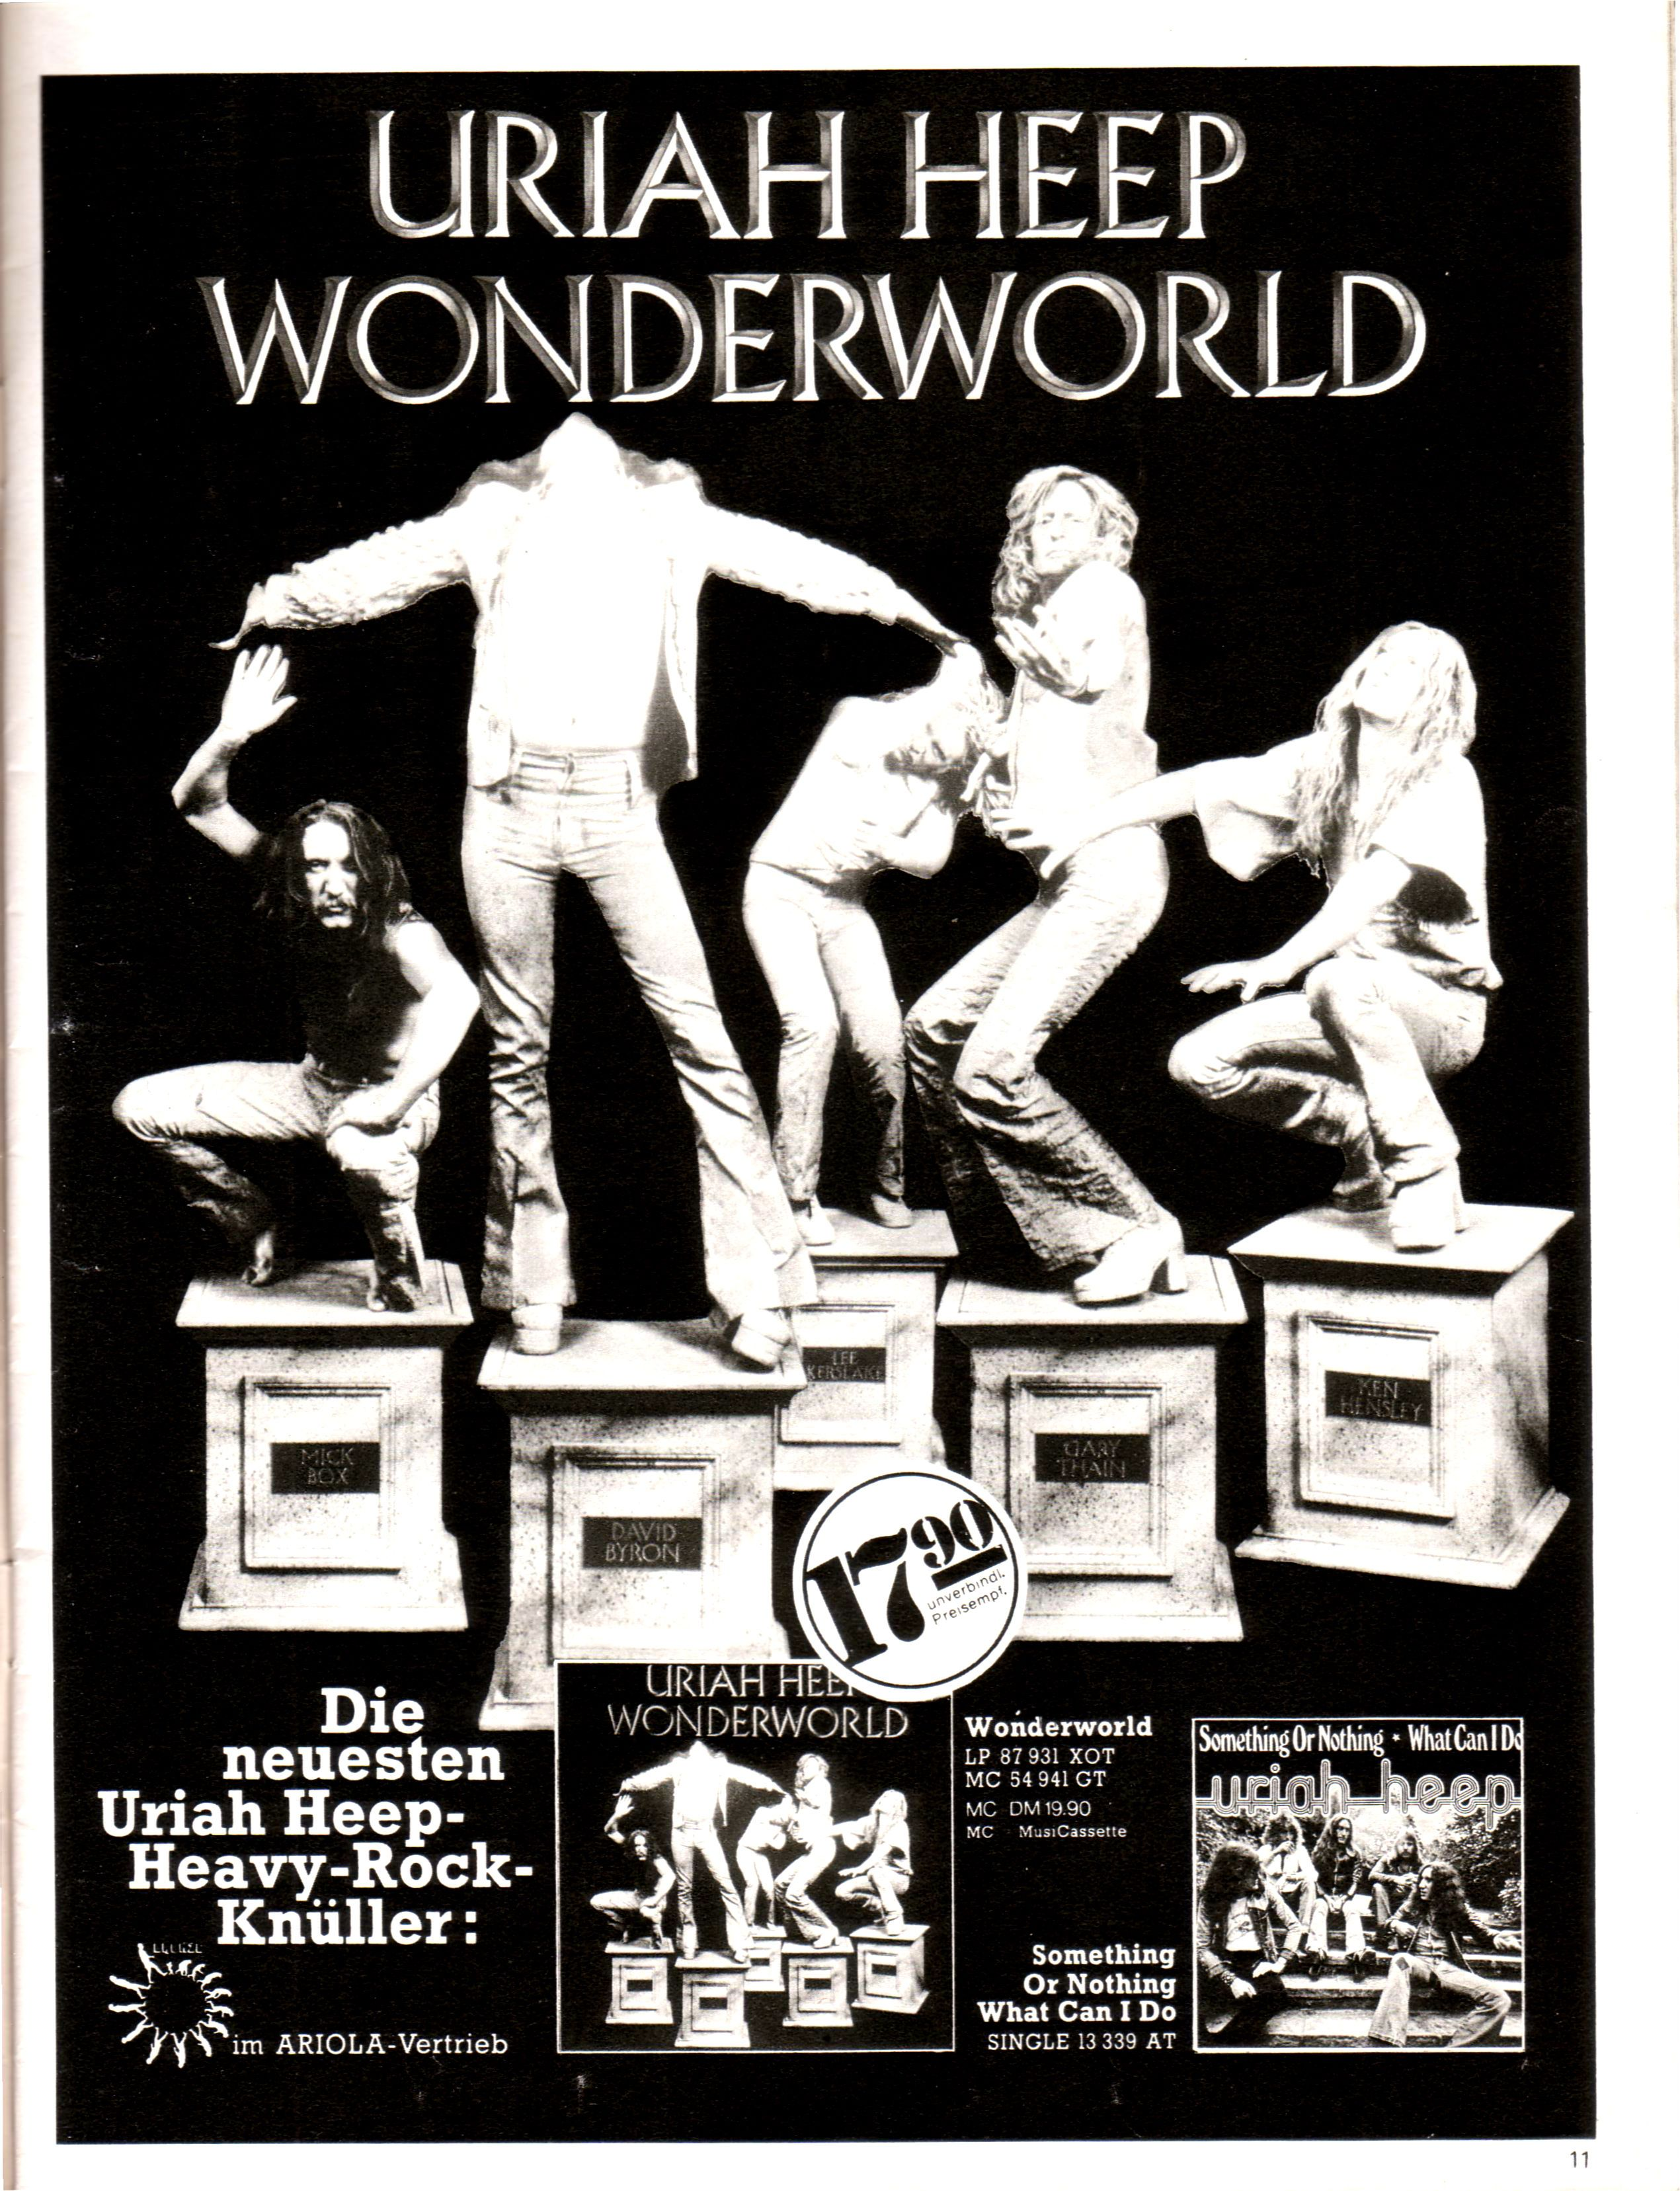 Uriah Heep Wonderworld Advert 1974 Music Concert Posters Uriah Heep